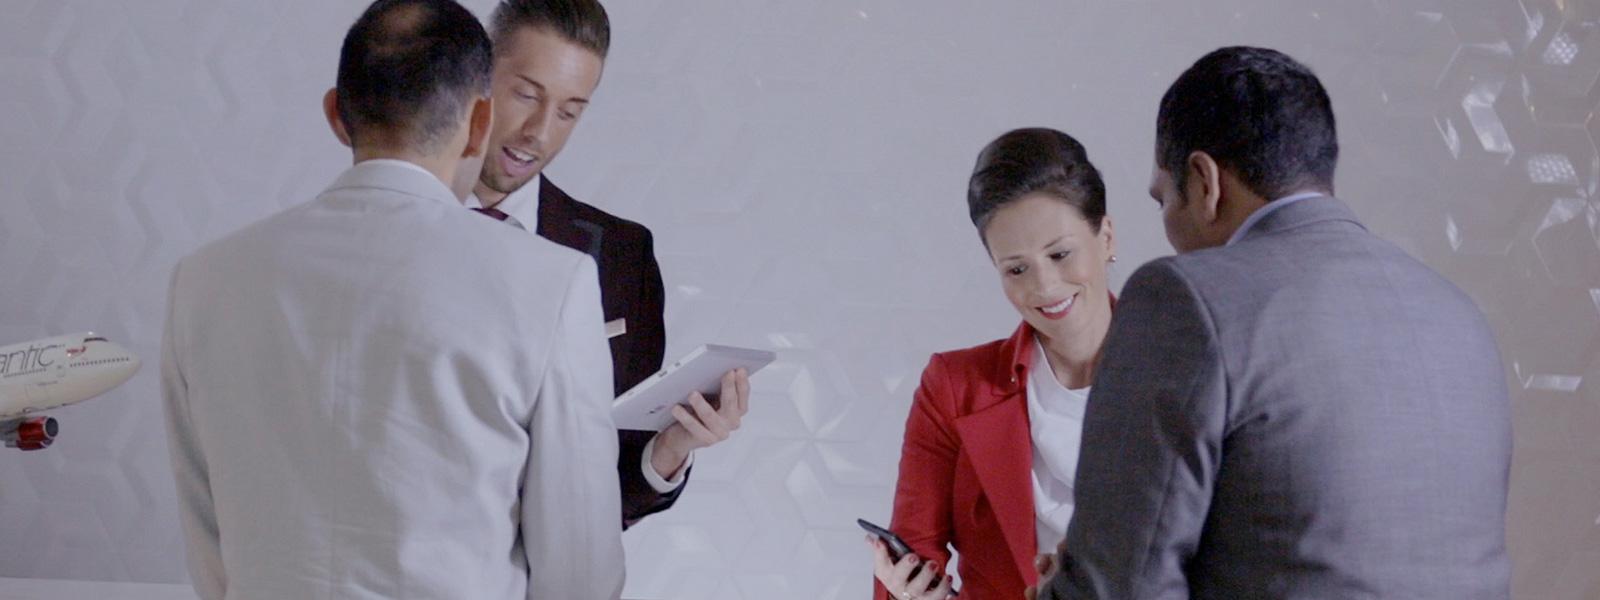 Virgin Atlantic employees interacting with customers